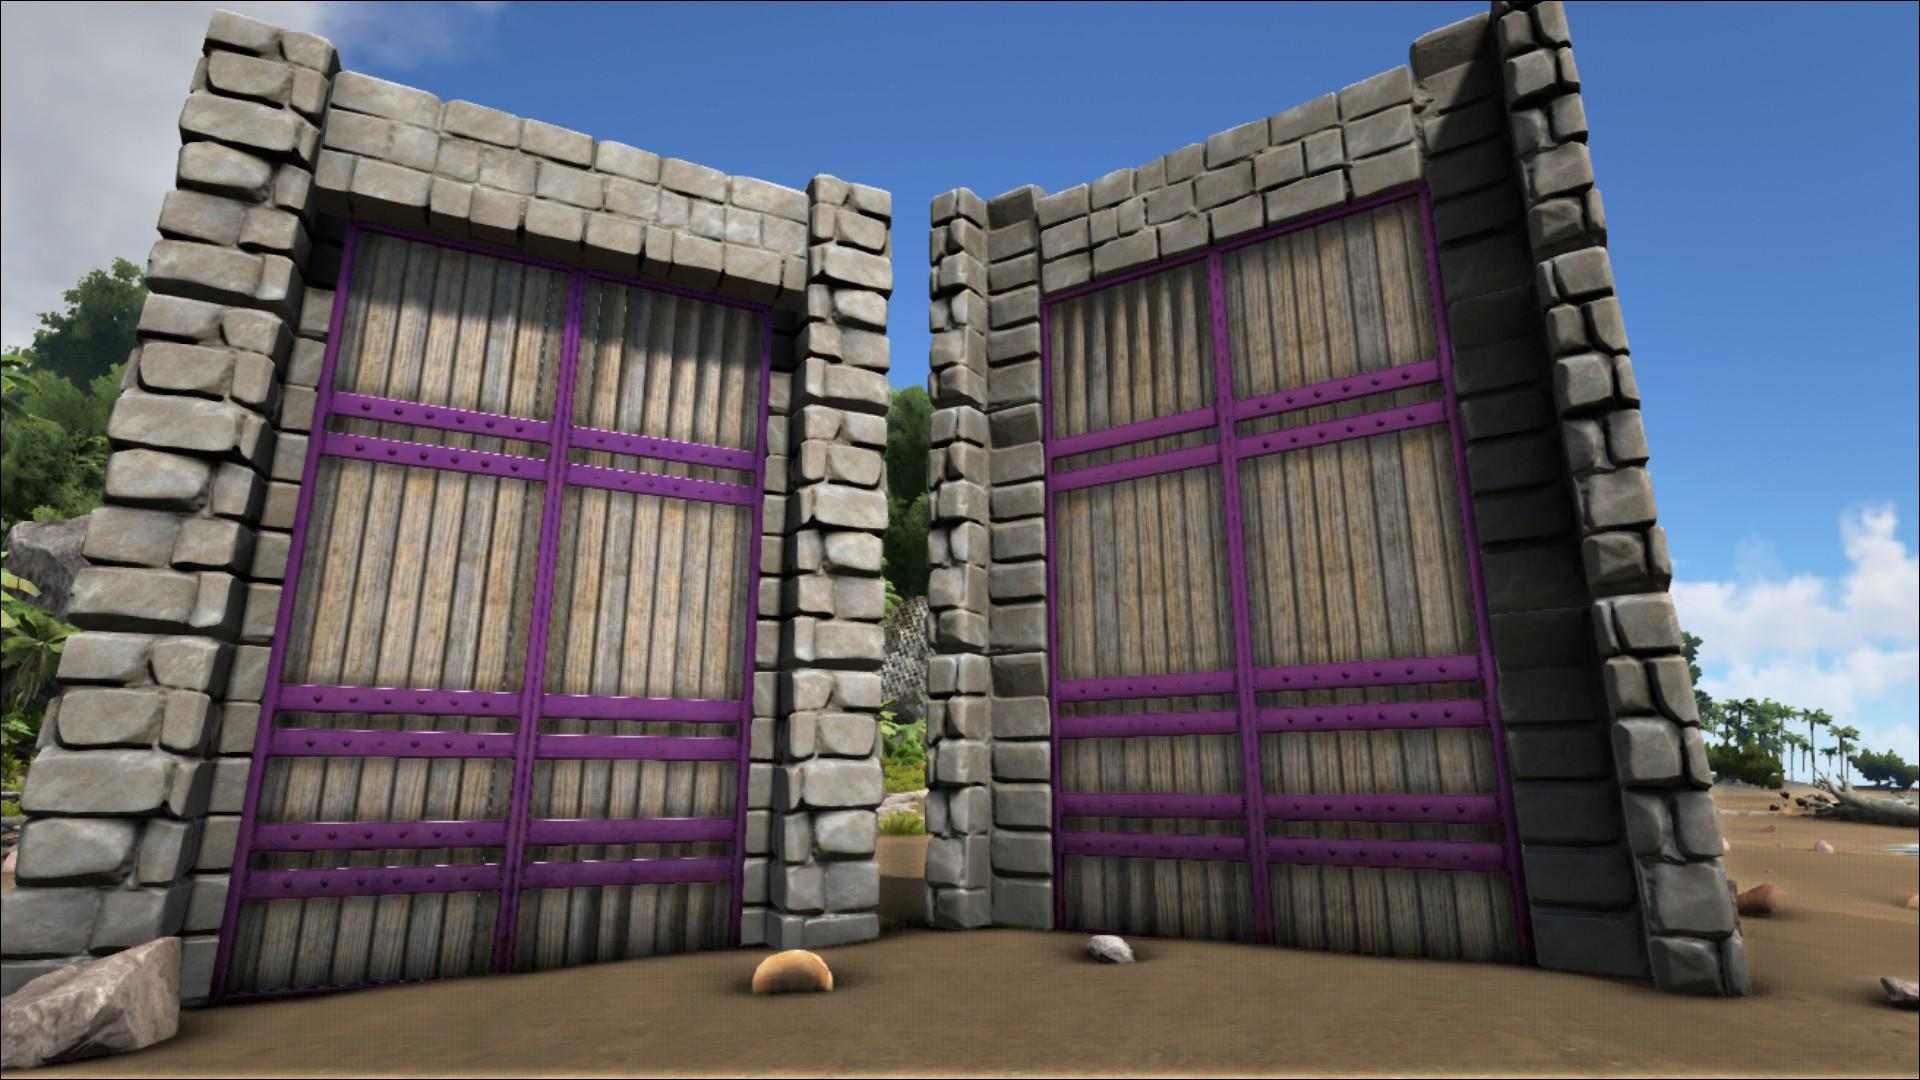 Region 1 Region 2 ... & Reinforced Dinosaur Gate - Official ARK: Survival Evolved Wiki Pezcame.Com